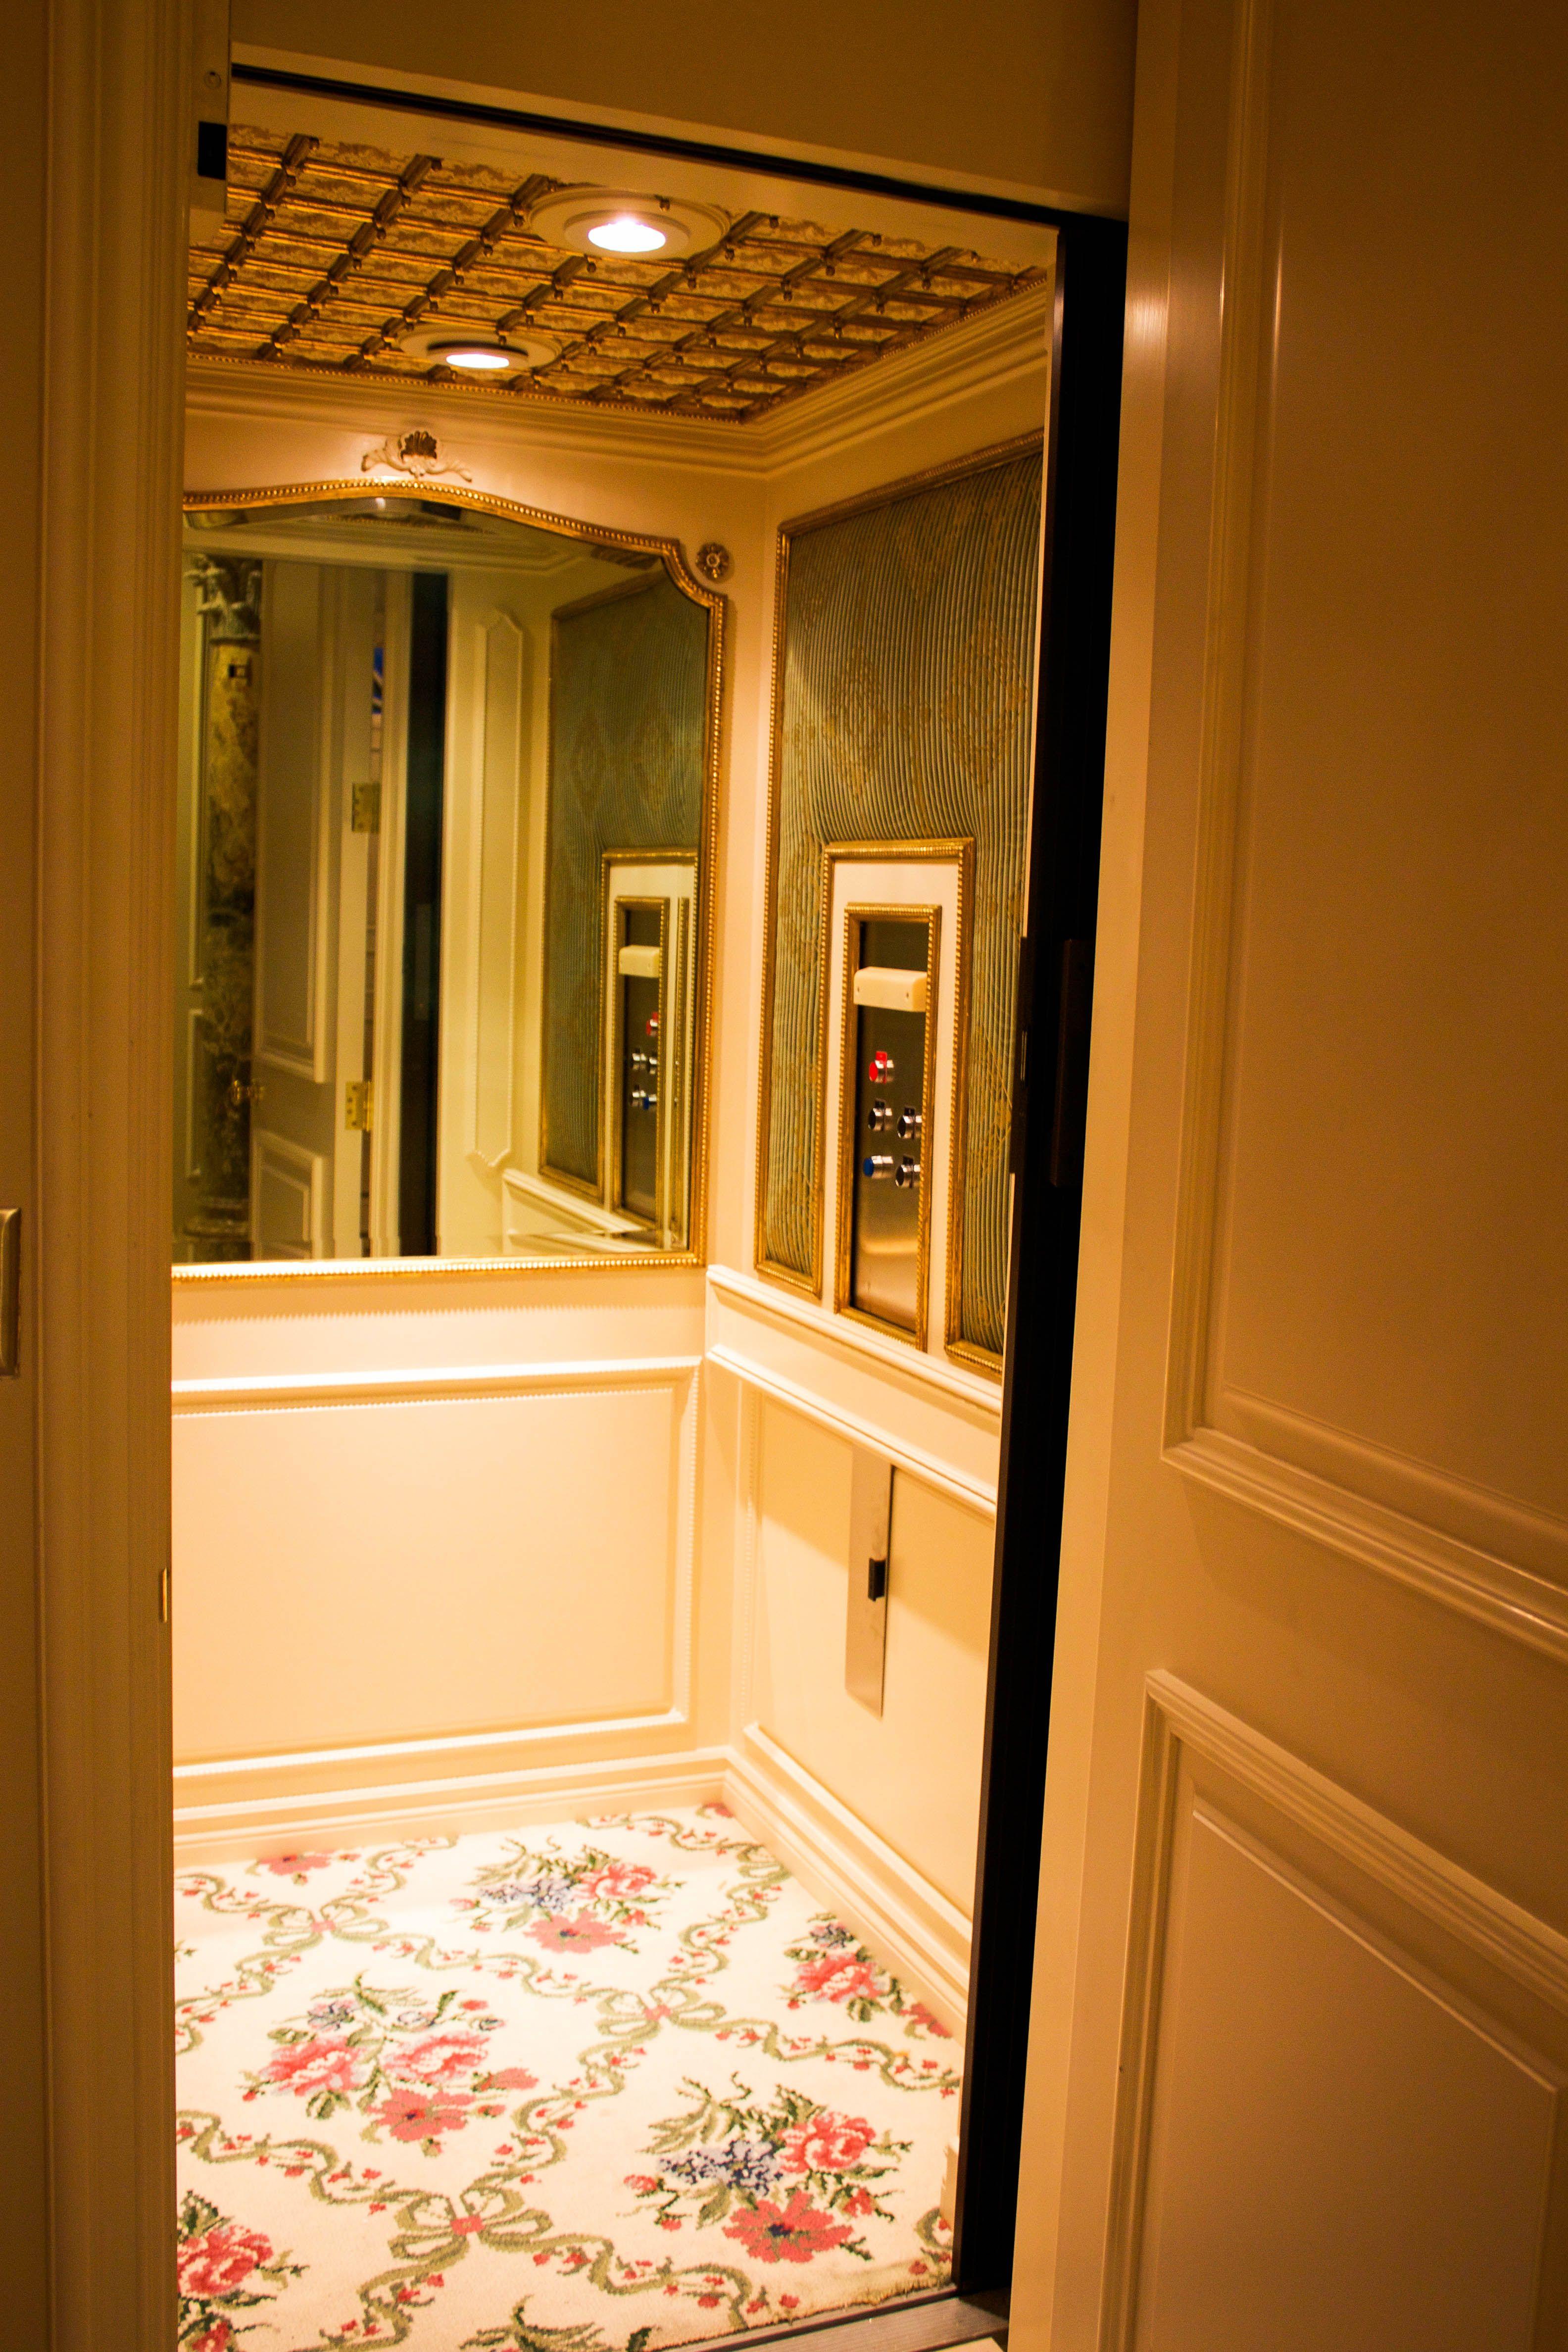 residential elevator interiors - Google Search | Elevator ...